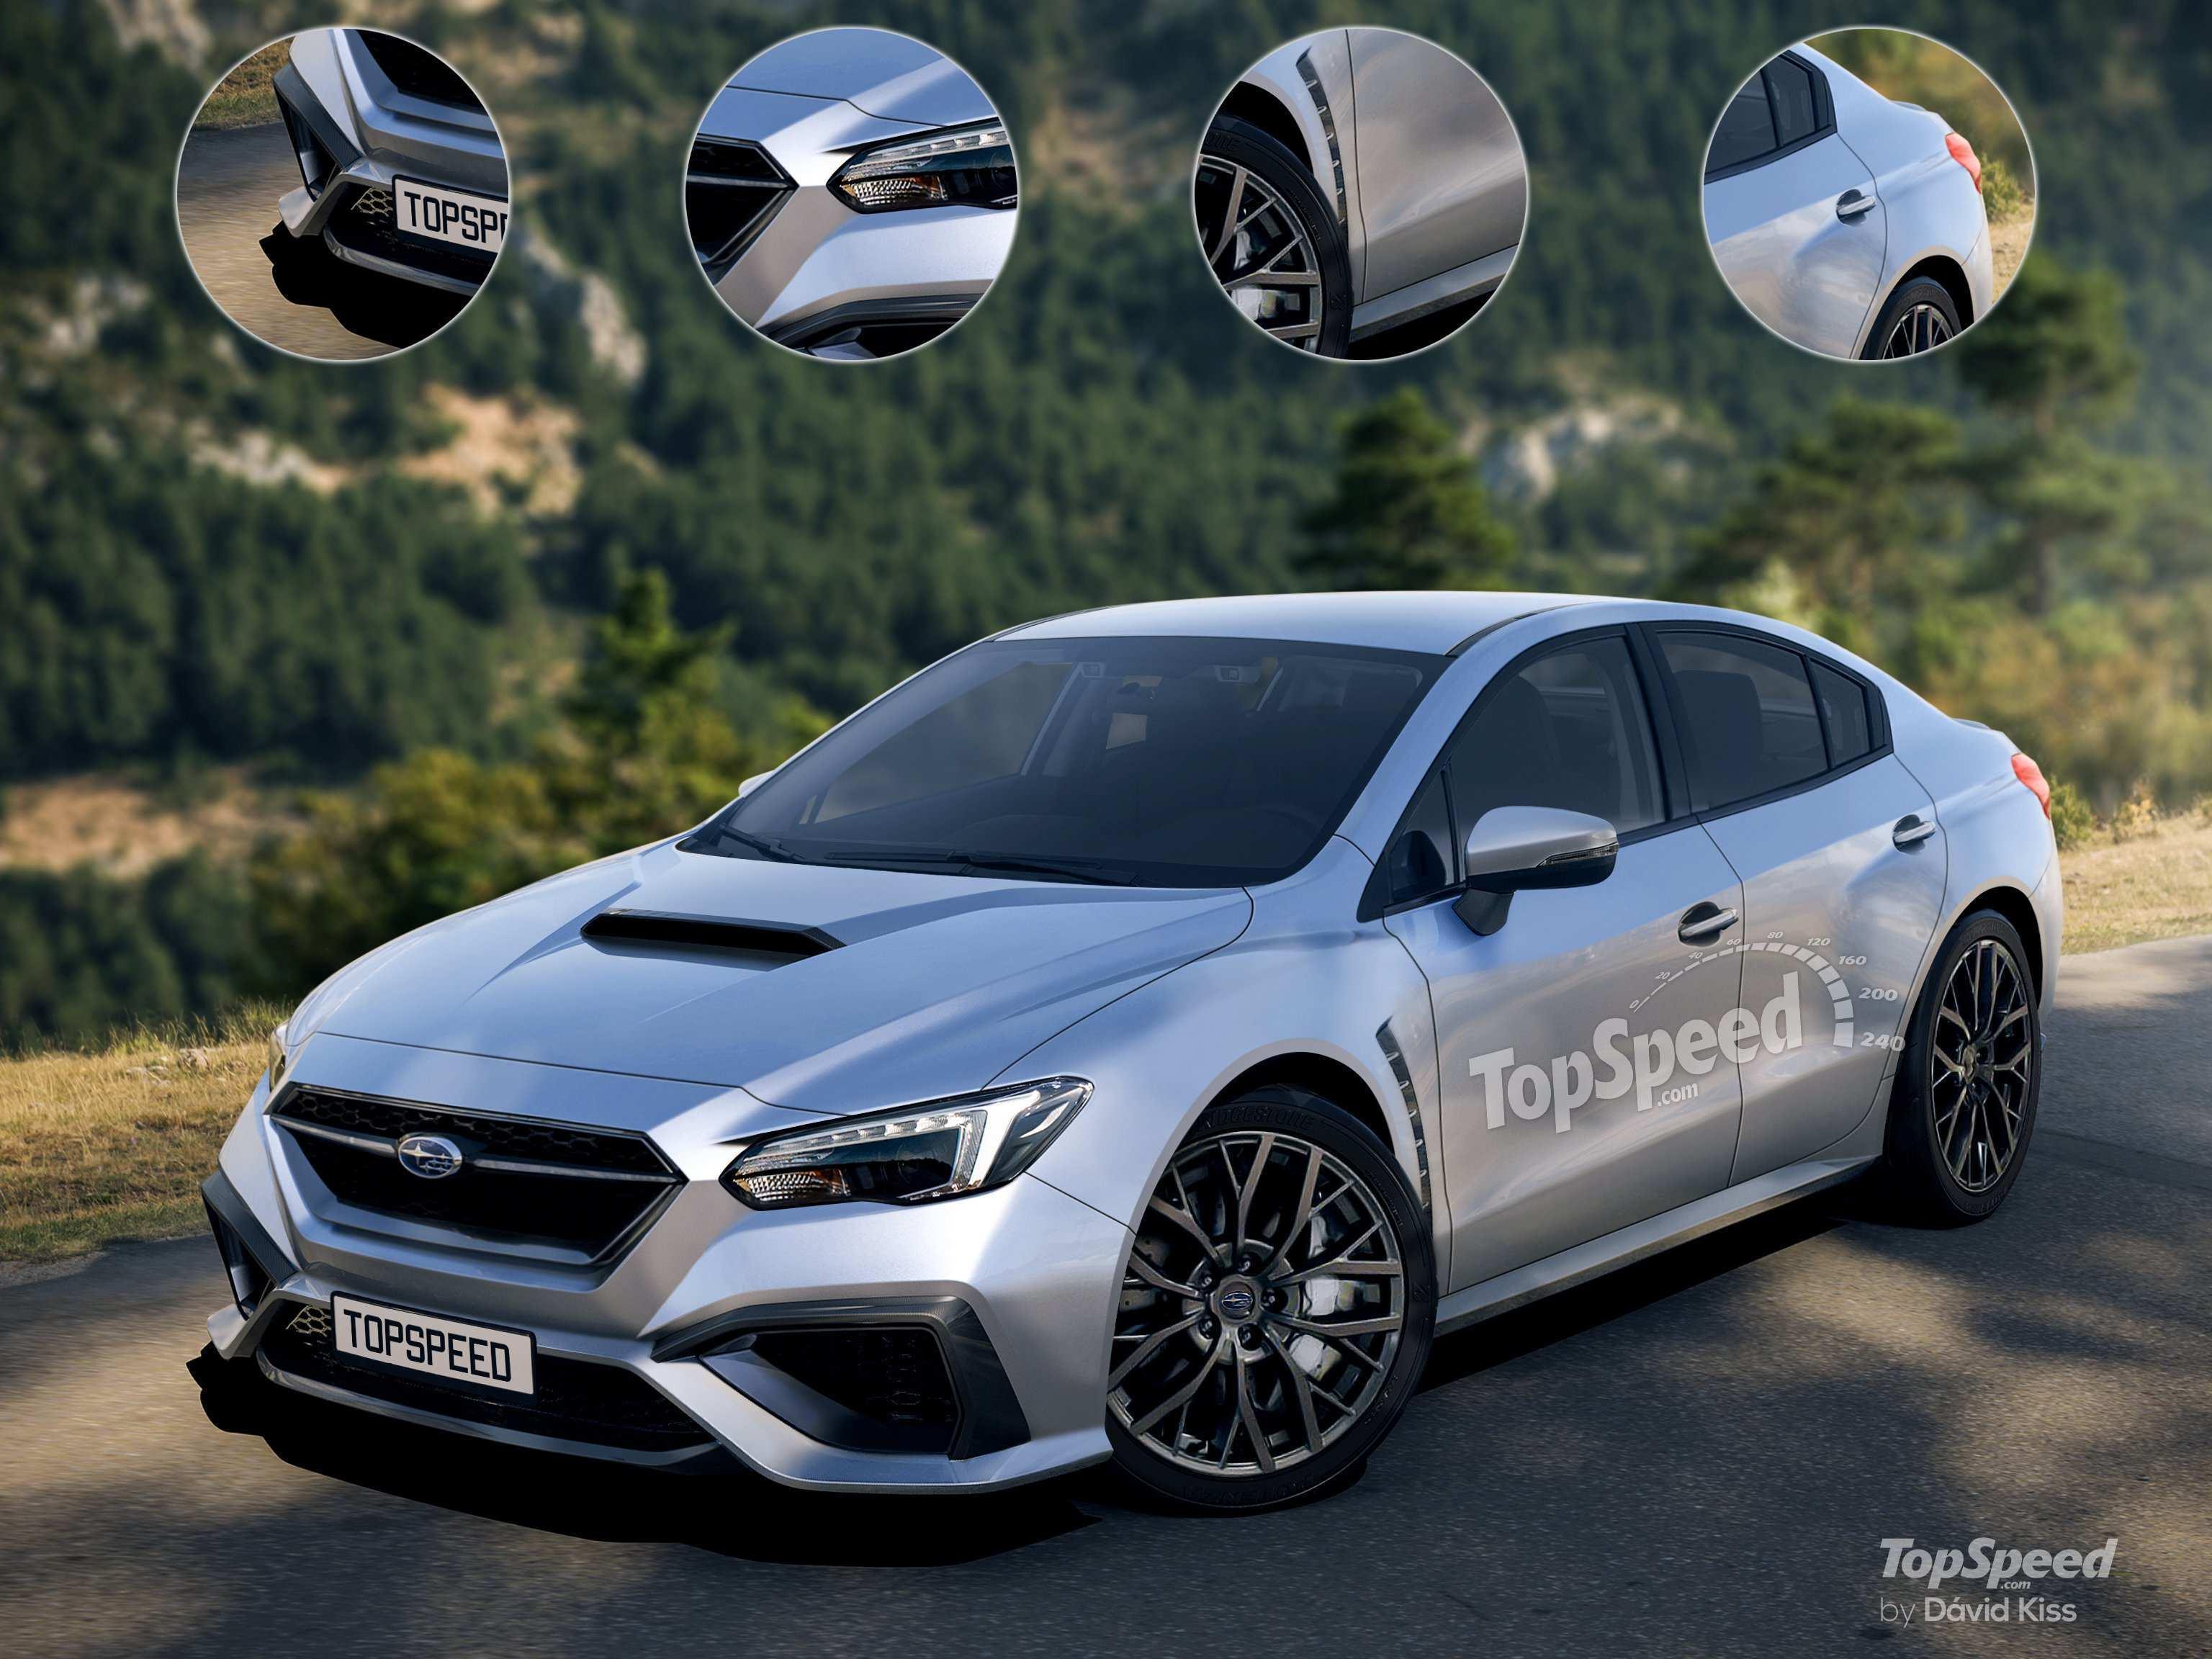 72 Best Review Subaru Sti Hatchback 2020 New Review for Subaru Sti Hatchback 2020